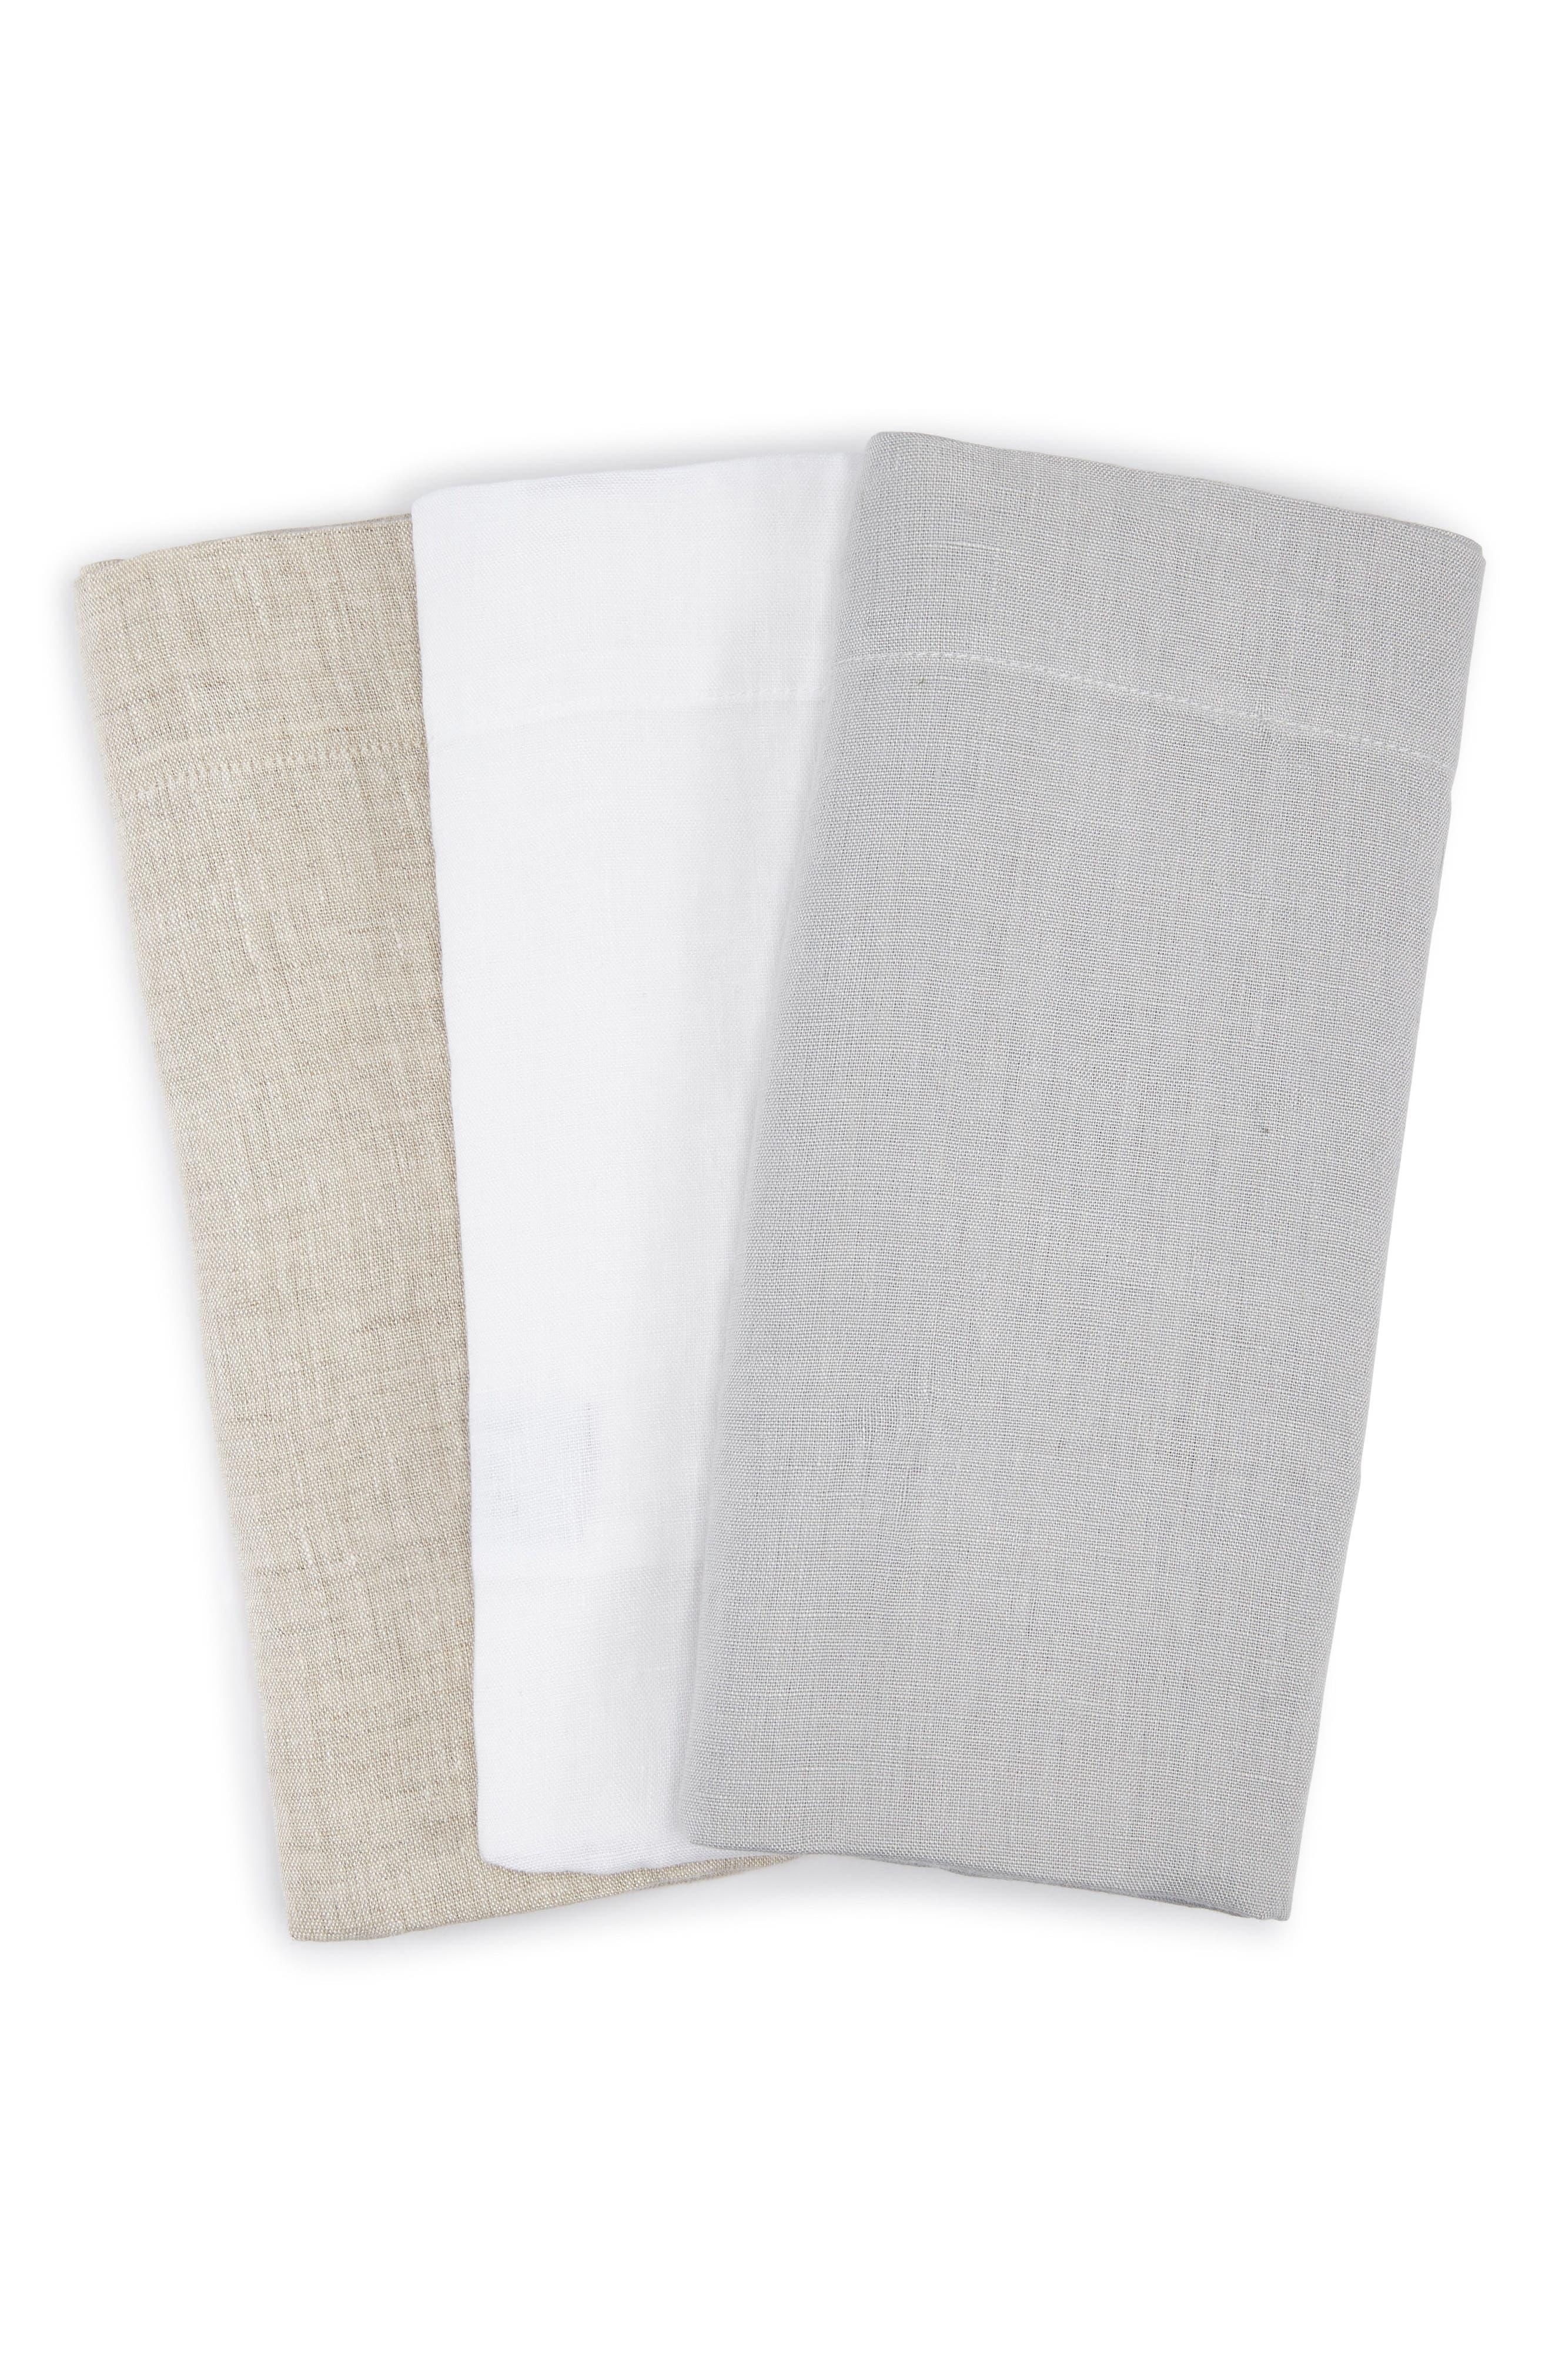 Alternate Image 3  - KASSATEX Lino Linen 300 Thread Count Pillowcase